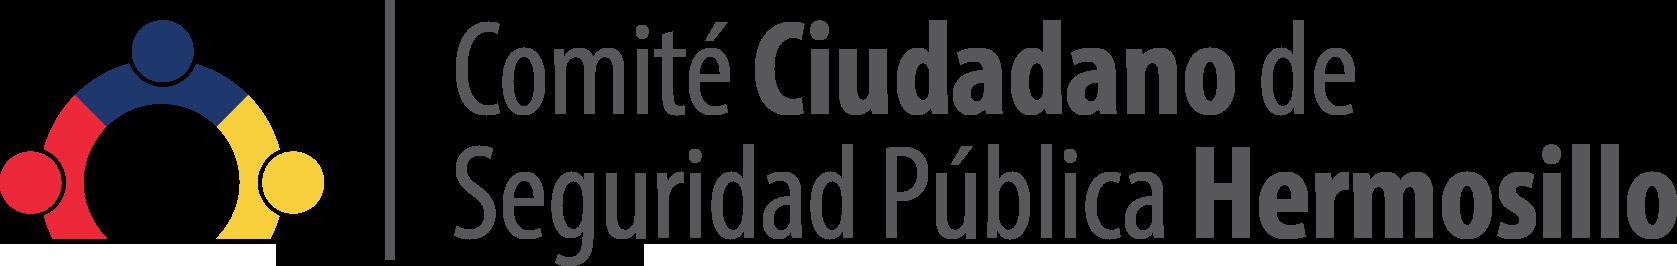 CCSP Hermosillo